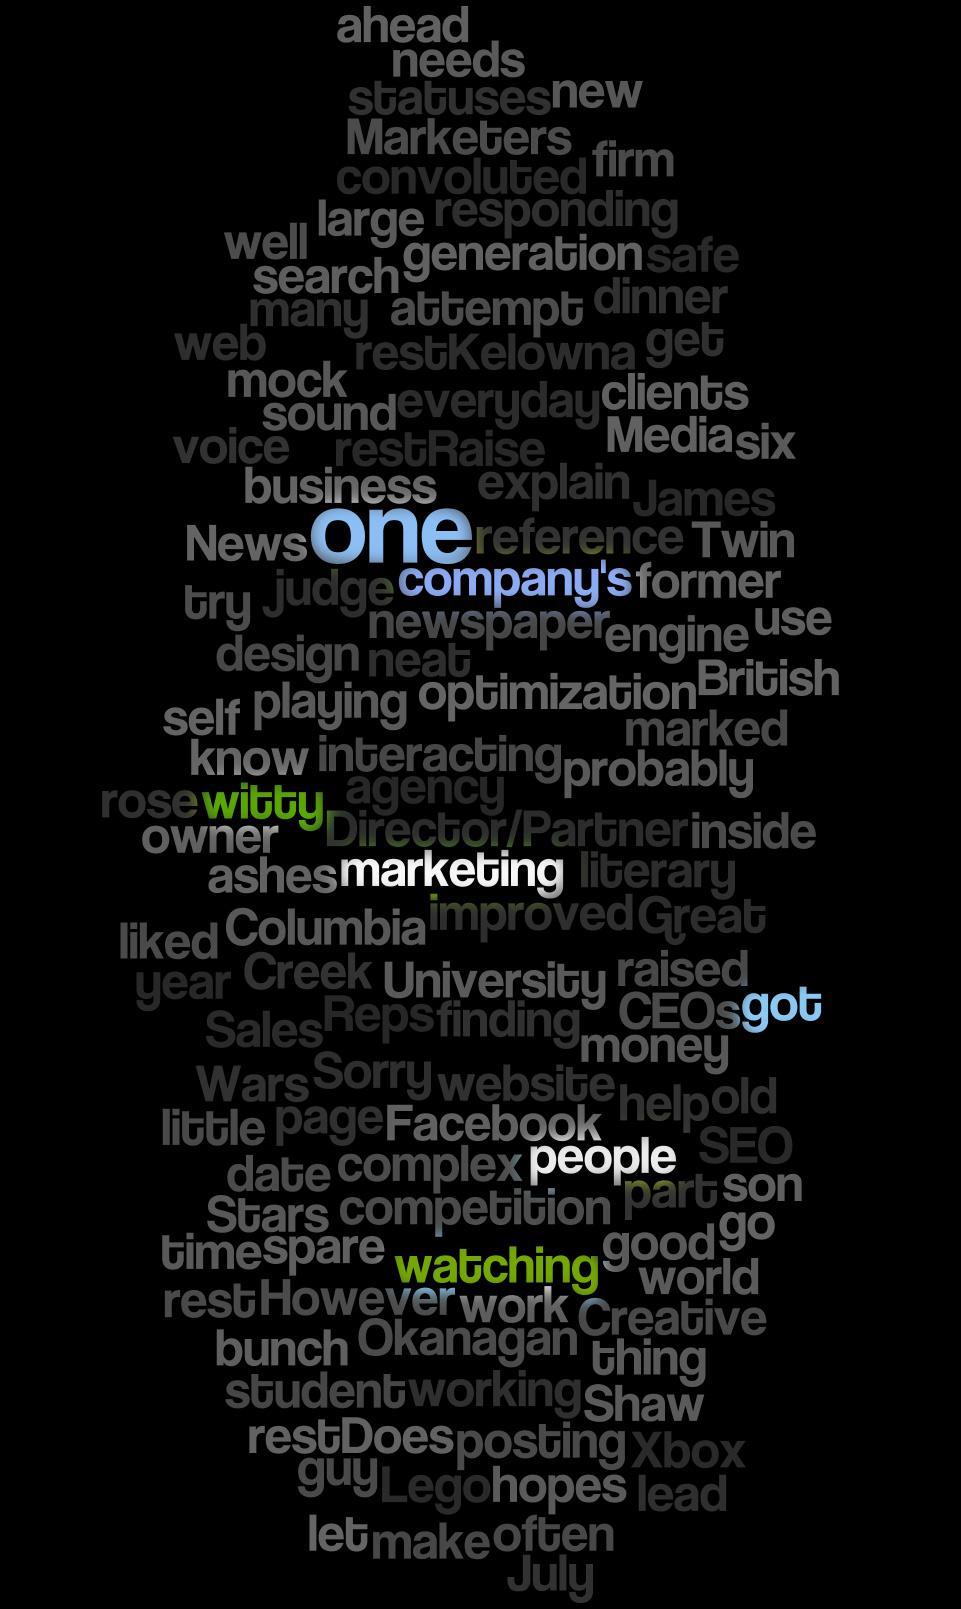 Words As Art by Kelowna Web Design Company